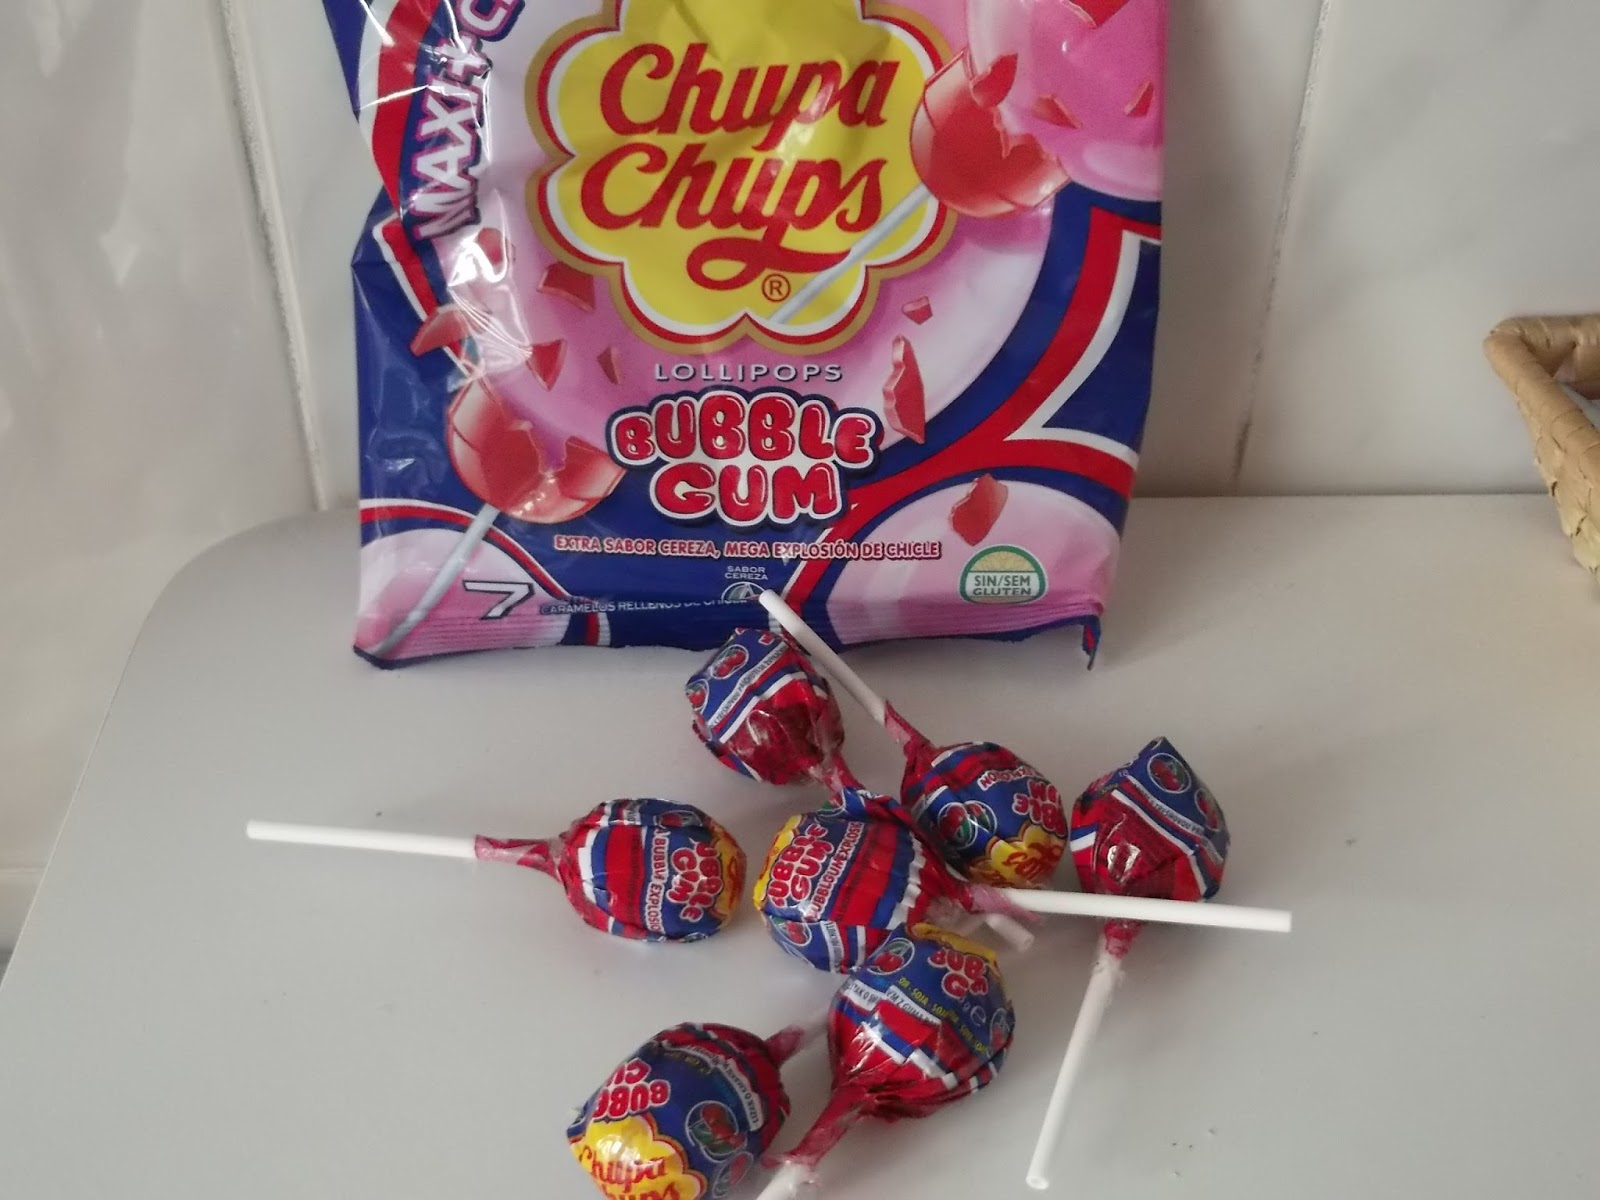 Belswan degustabox caja de abril - Housse de couette chupa chups ...